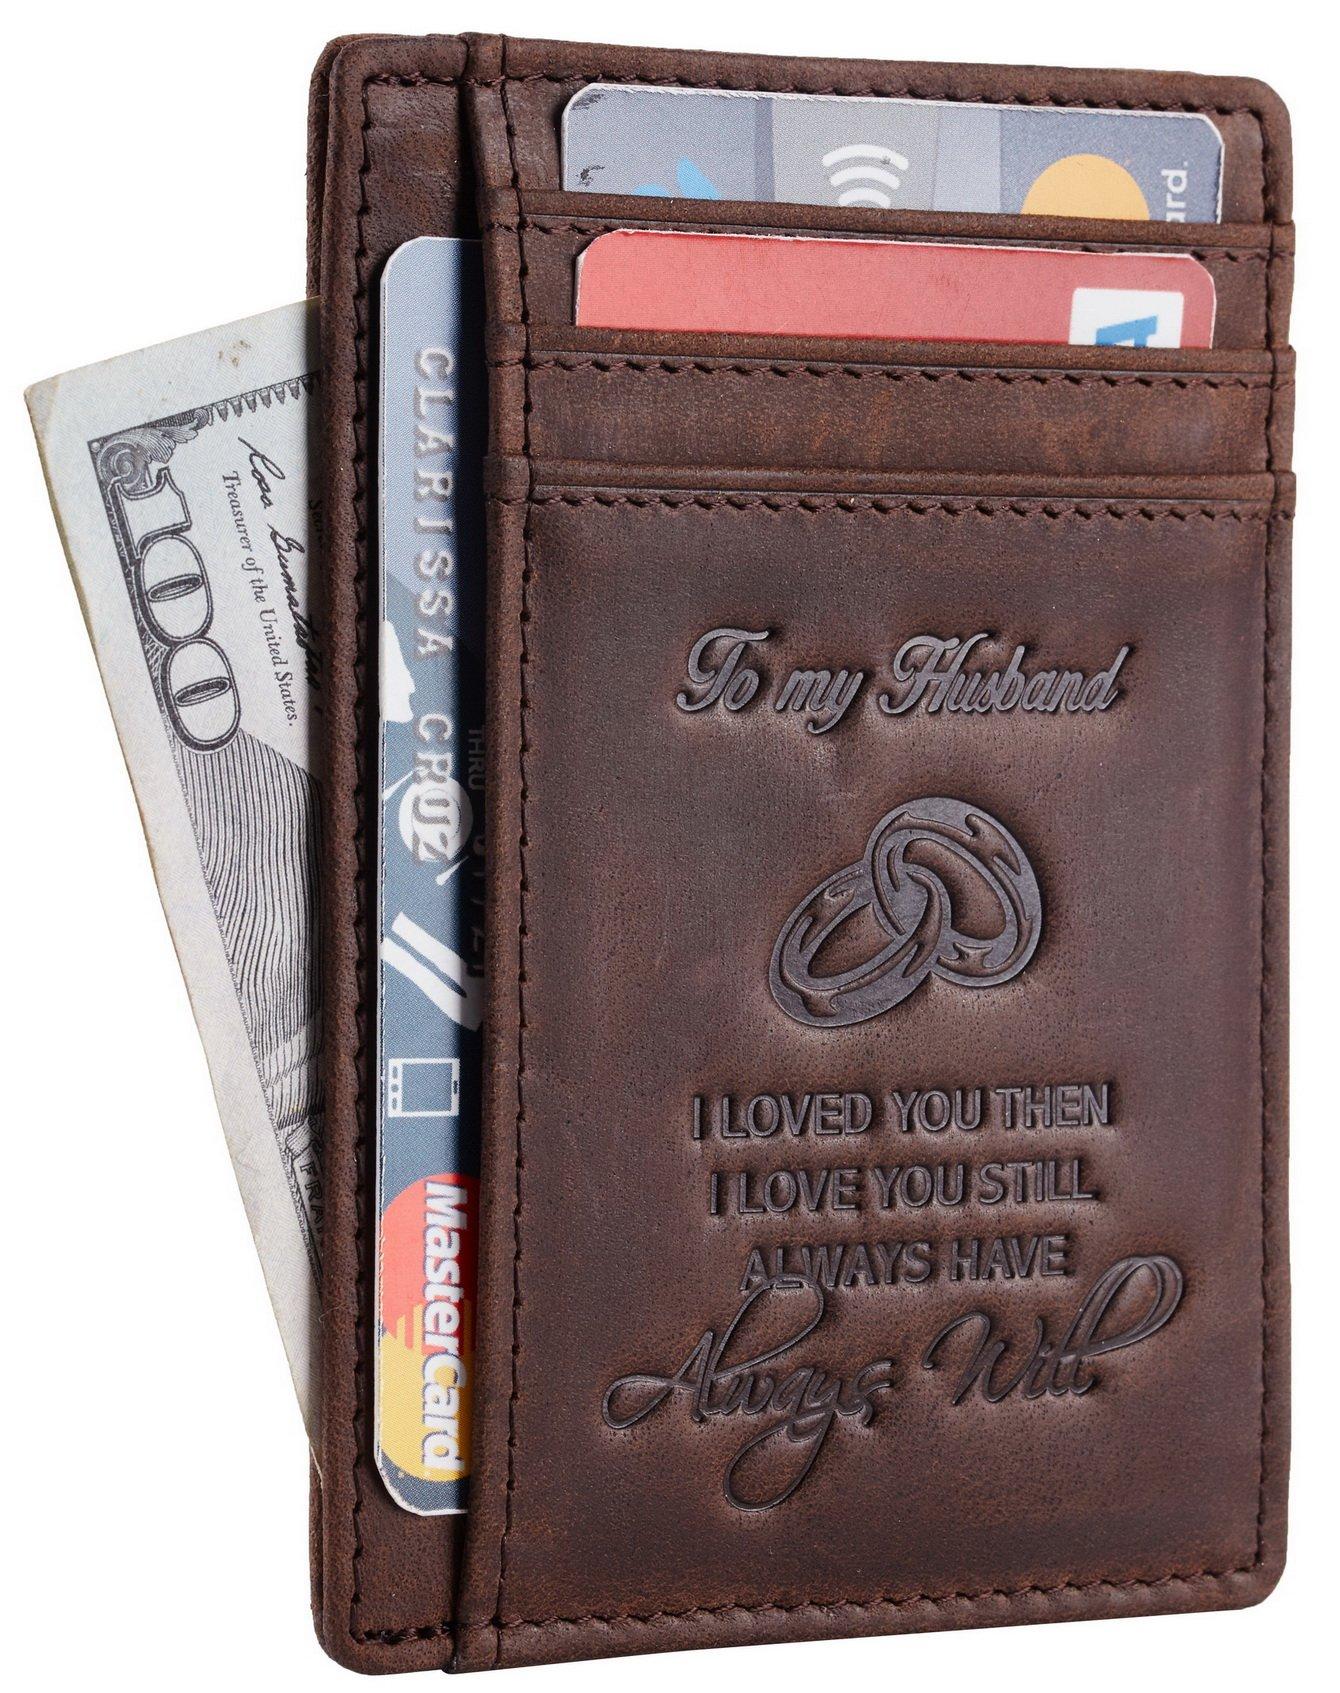 NapaWalli Wife To Husband Gift Best Anniversary Birthday Gifts For Him Genuine Leather RFID Blocking slim Wallet Card Holder (Hunter Coffee)